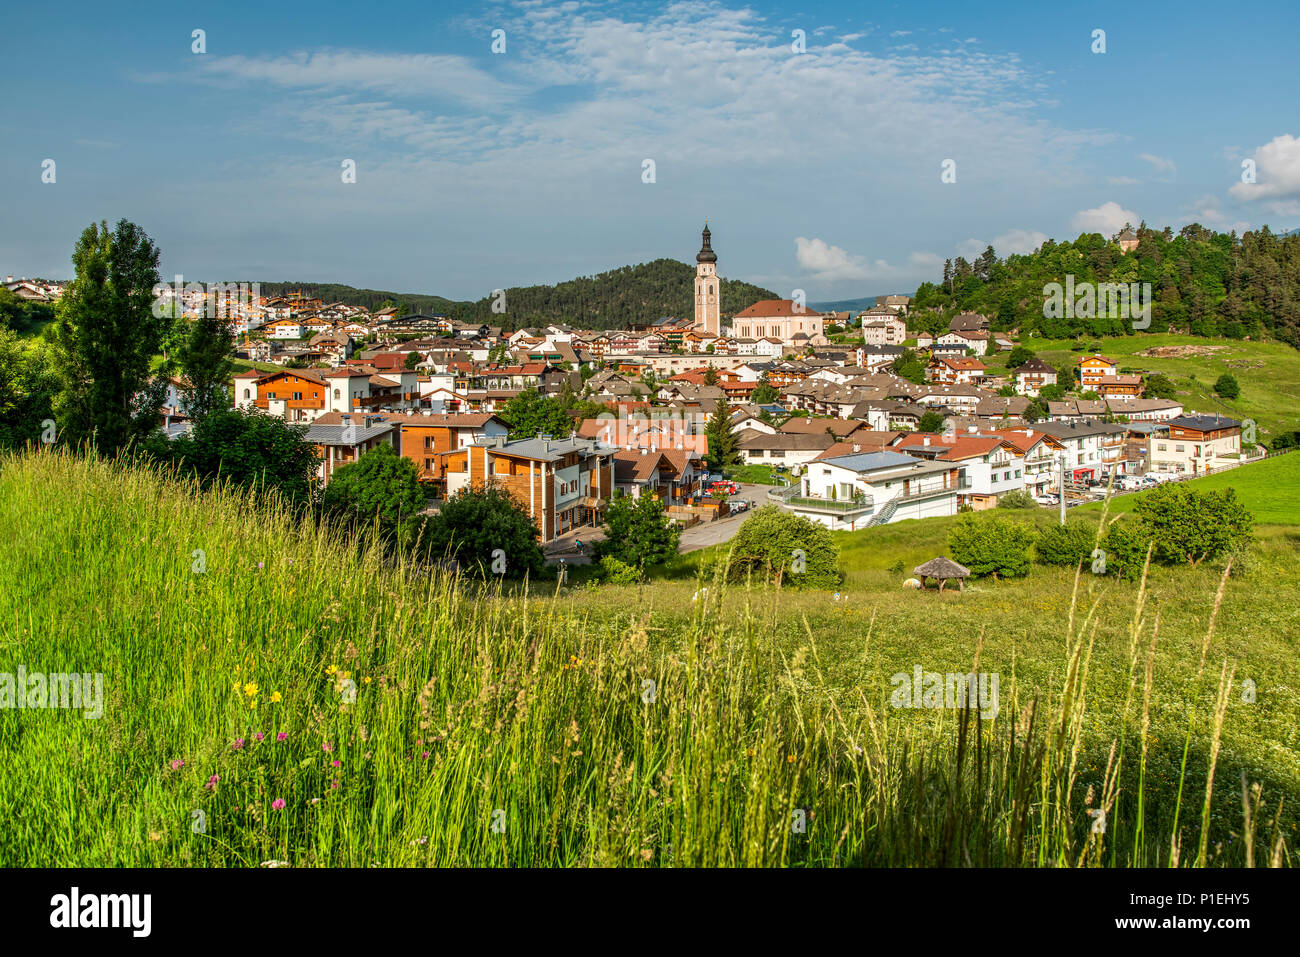 Castelrotto - Kastelruth, Trentino Alto Adige - South Tyrol, Italy - Stock Image